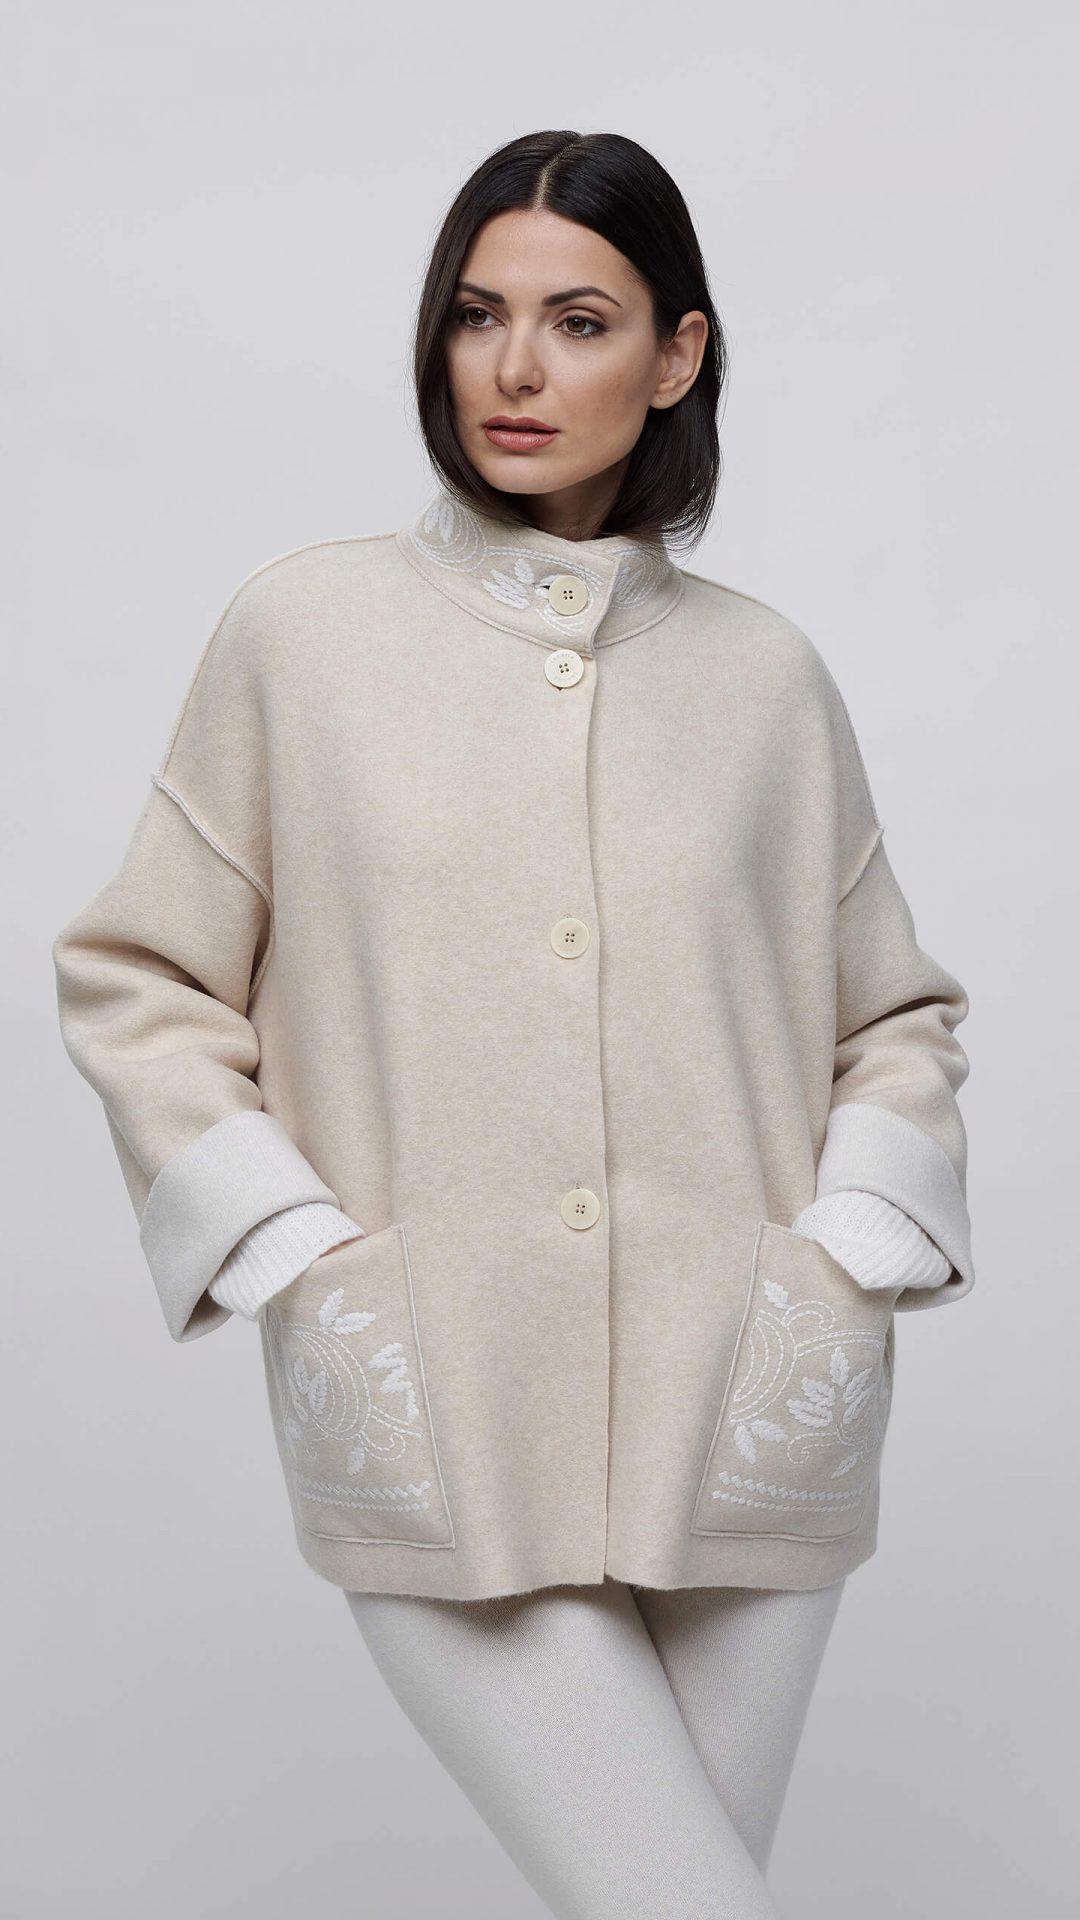 lunaria cashmere donna - Fall Winter 21/22